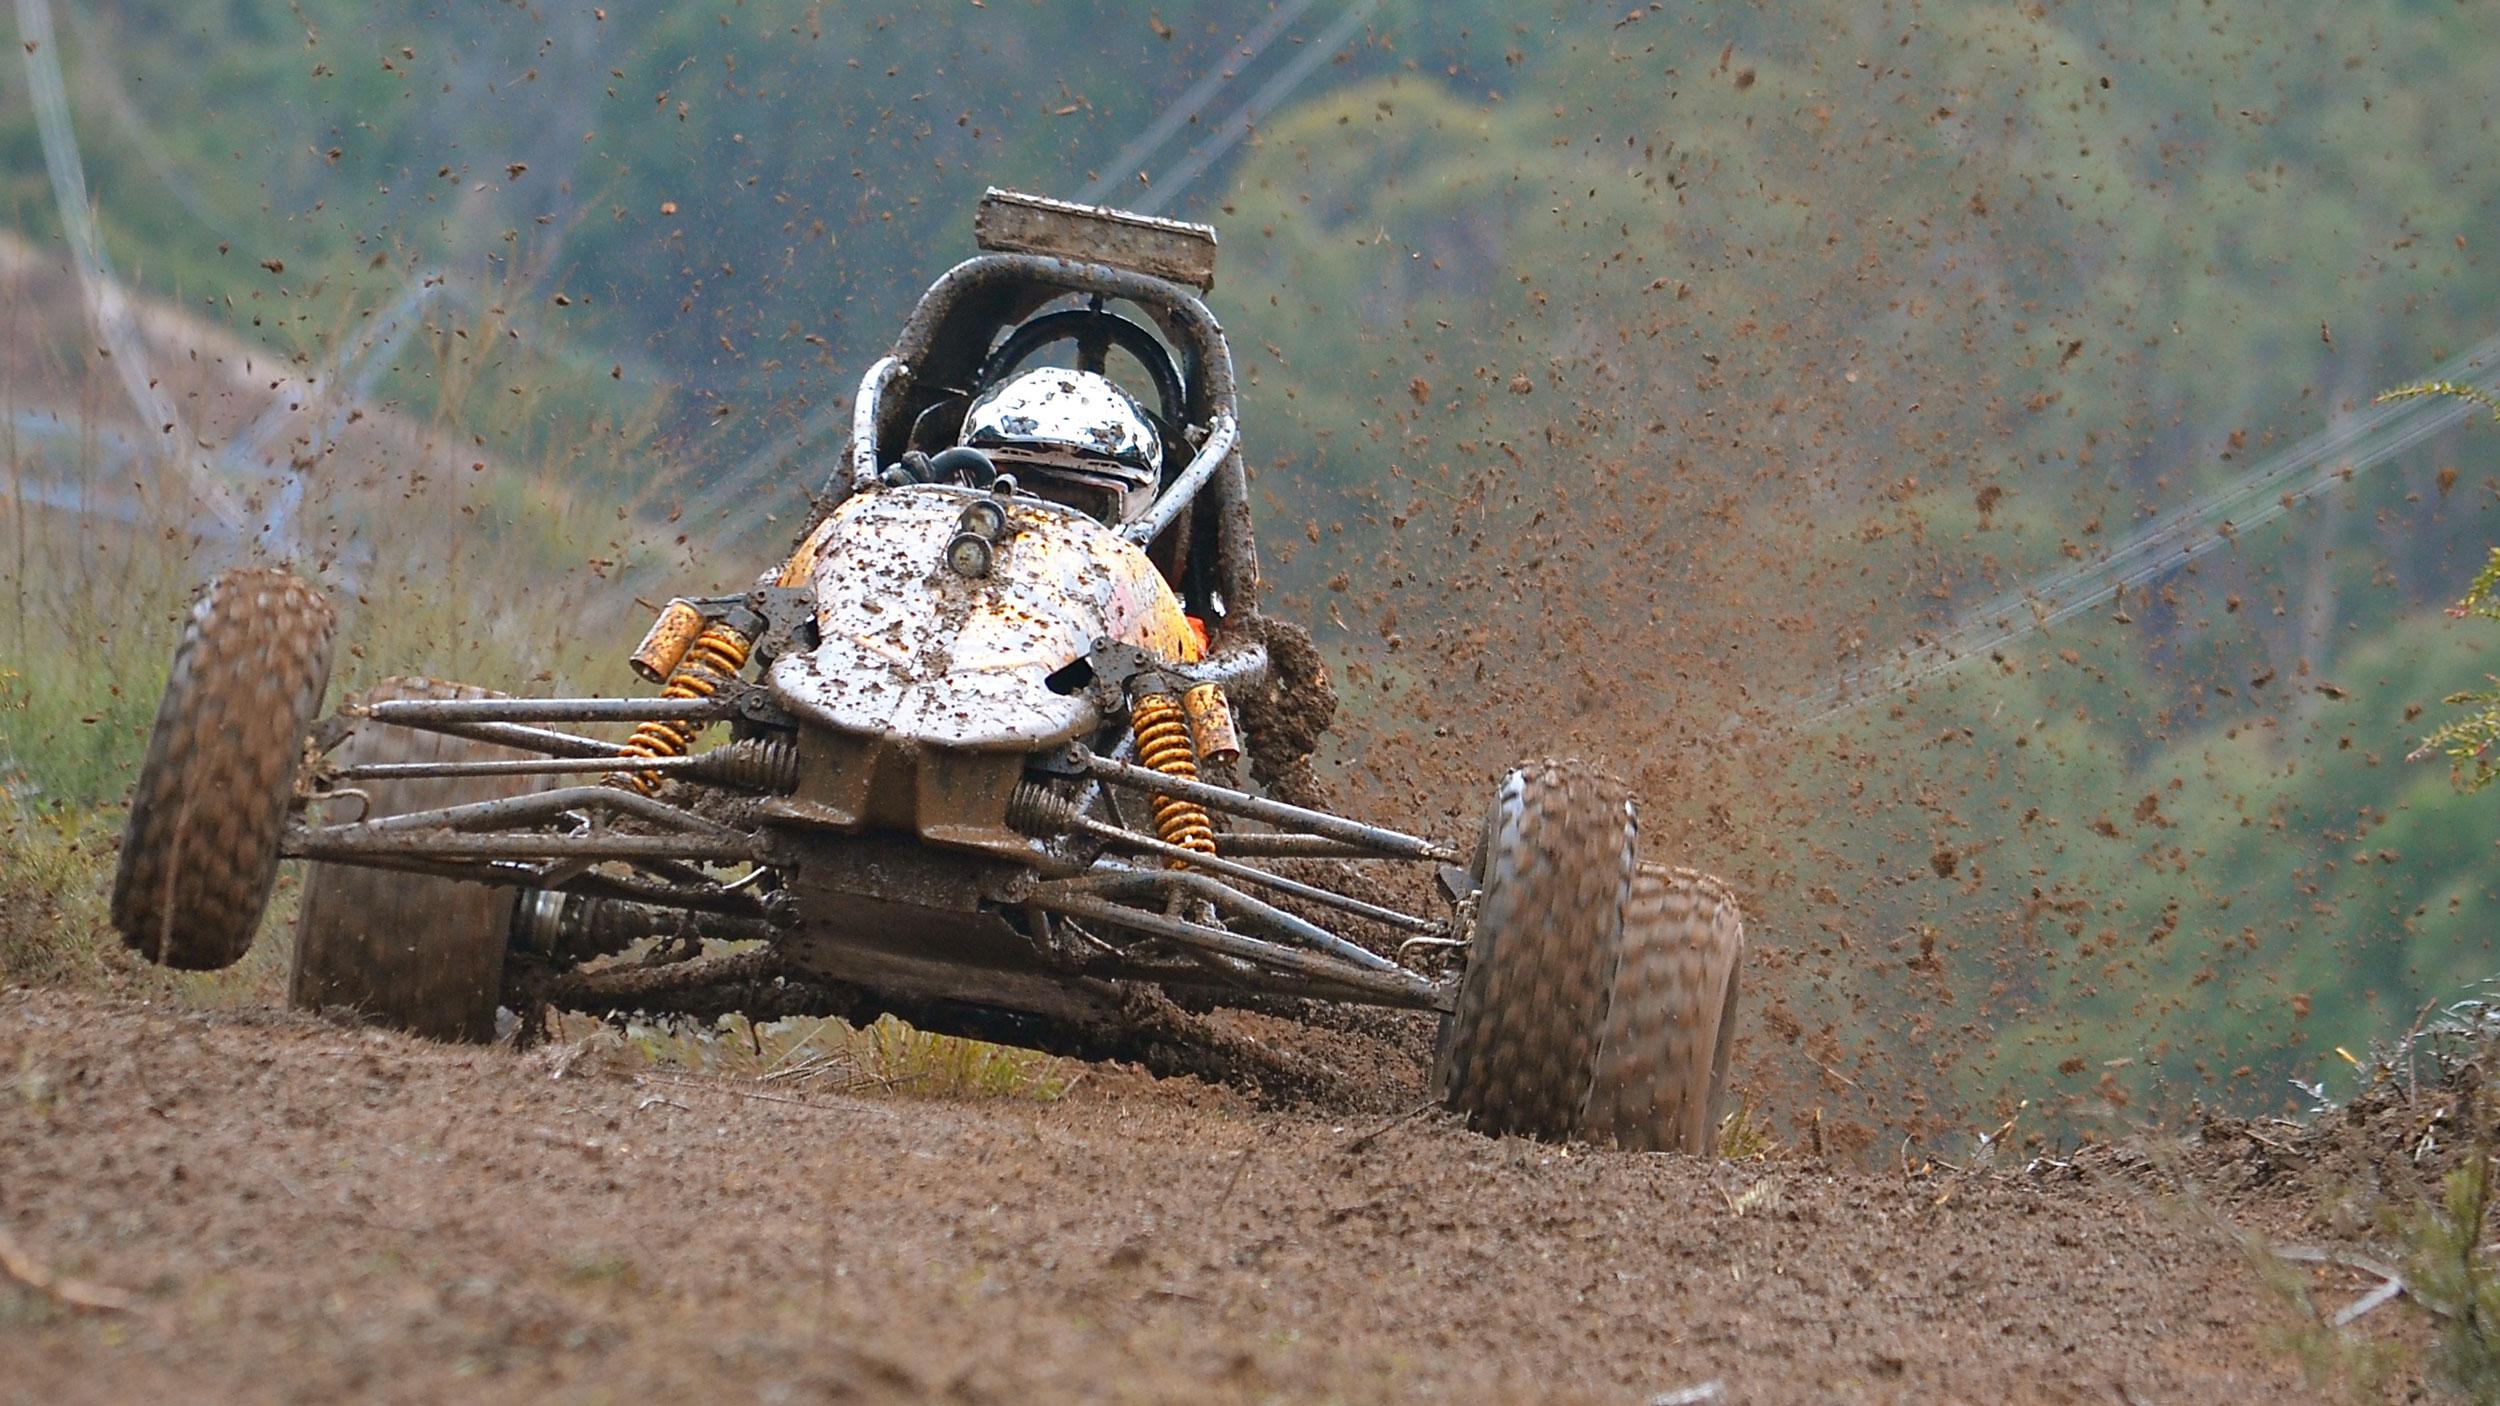 Buggy-Mud2-2500